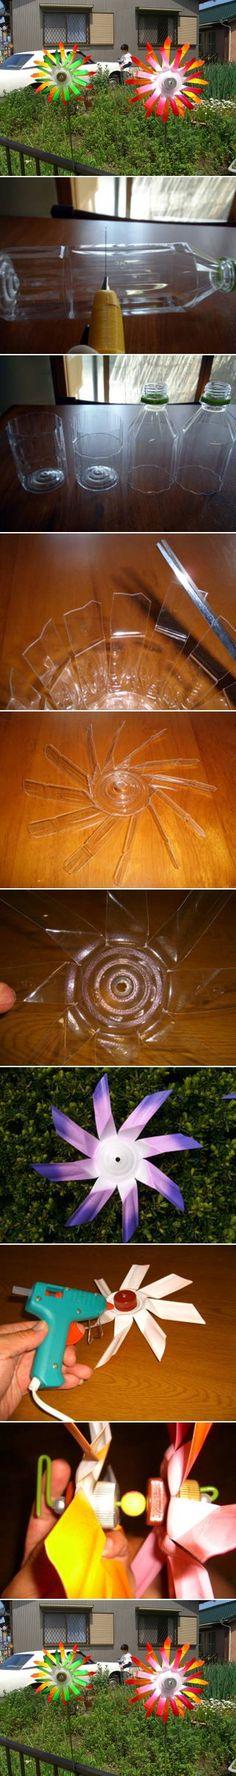 DIY Plastic Bottle Windmill DIY Projects